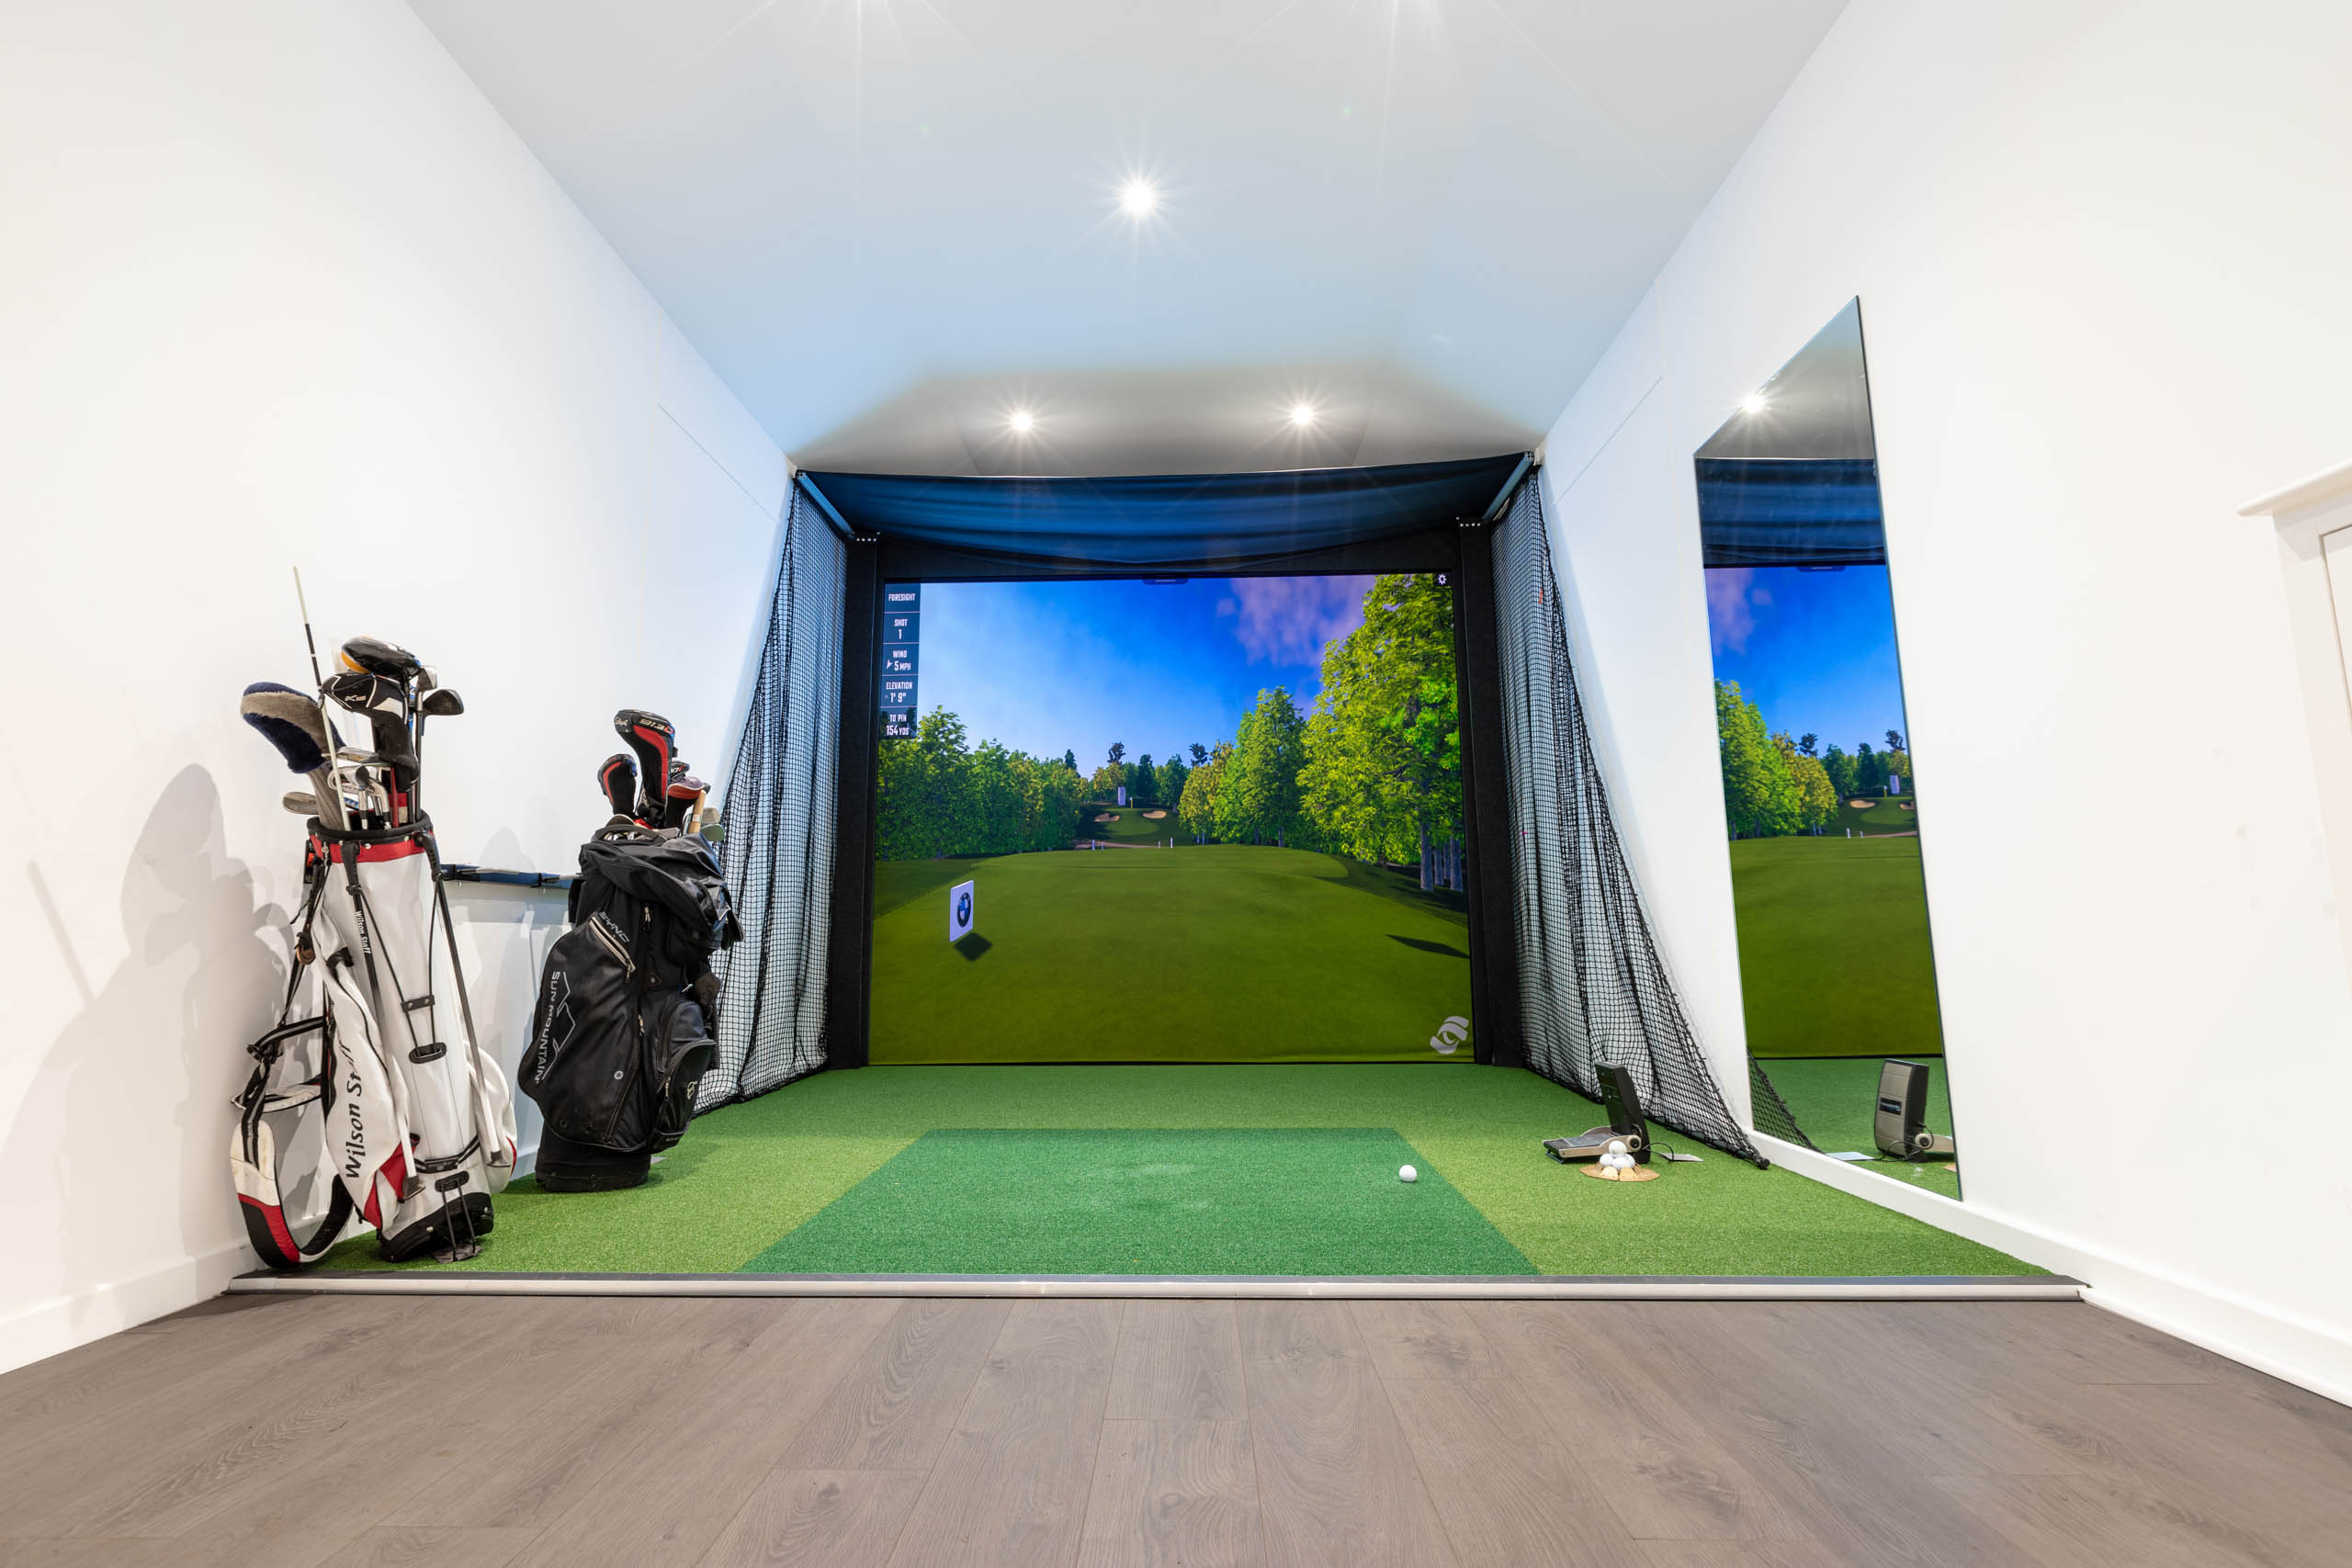 Foresight Sports Europe, Performance Series Golf Simulator